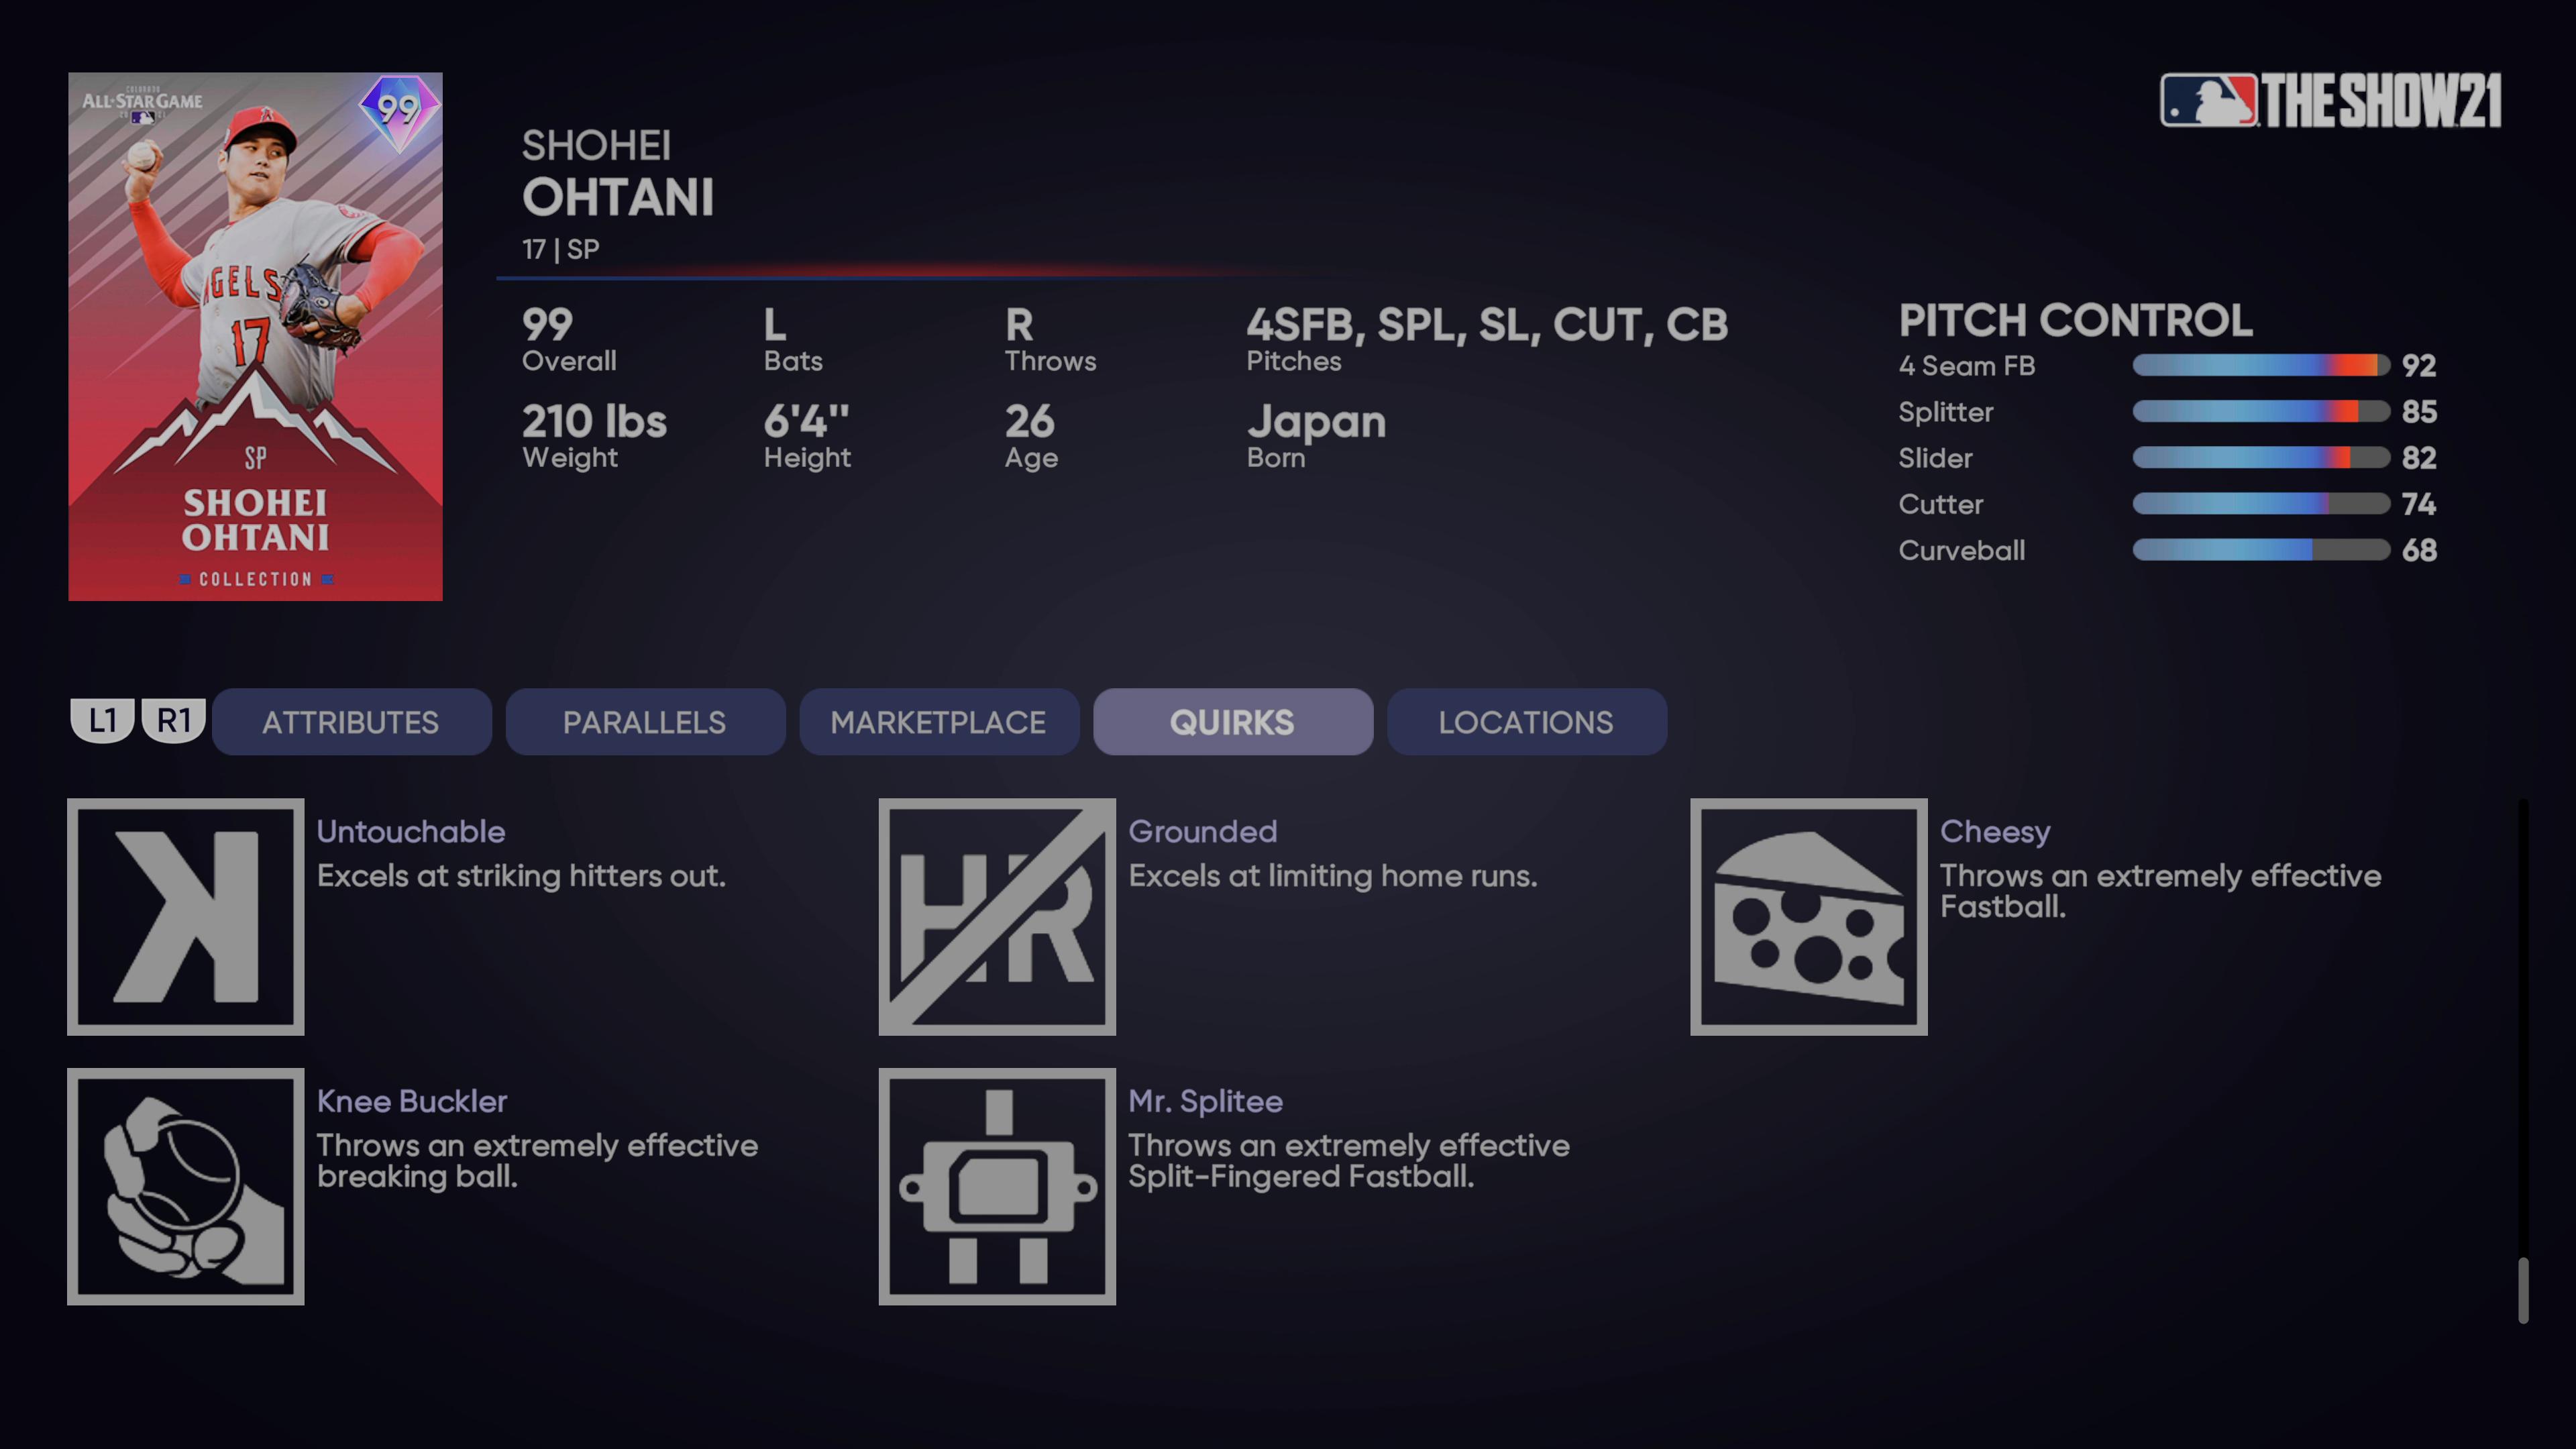 MLB The Show 21 - Home Run Derby_2021-07-13_02-07-57